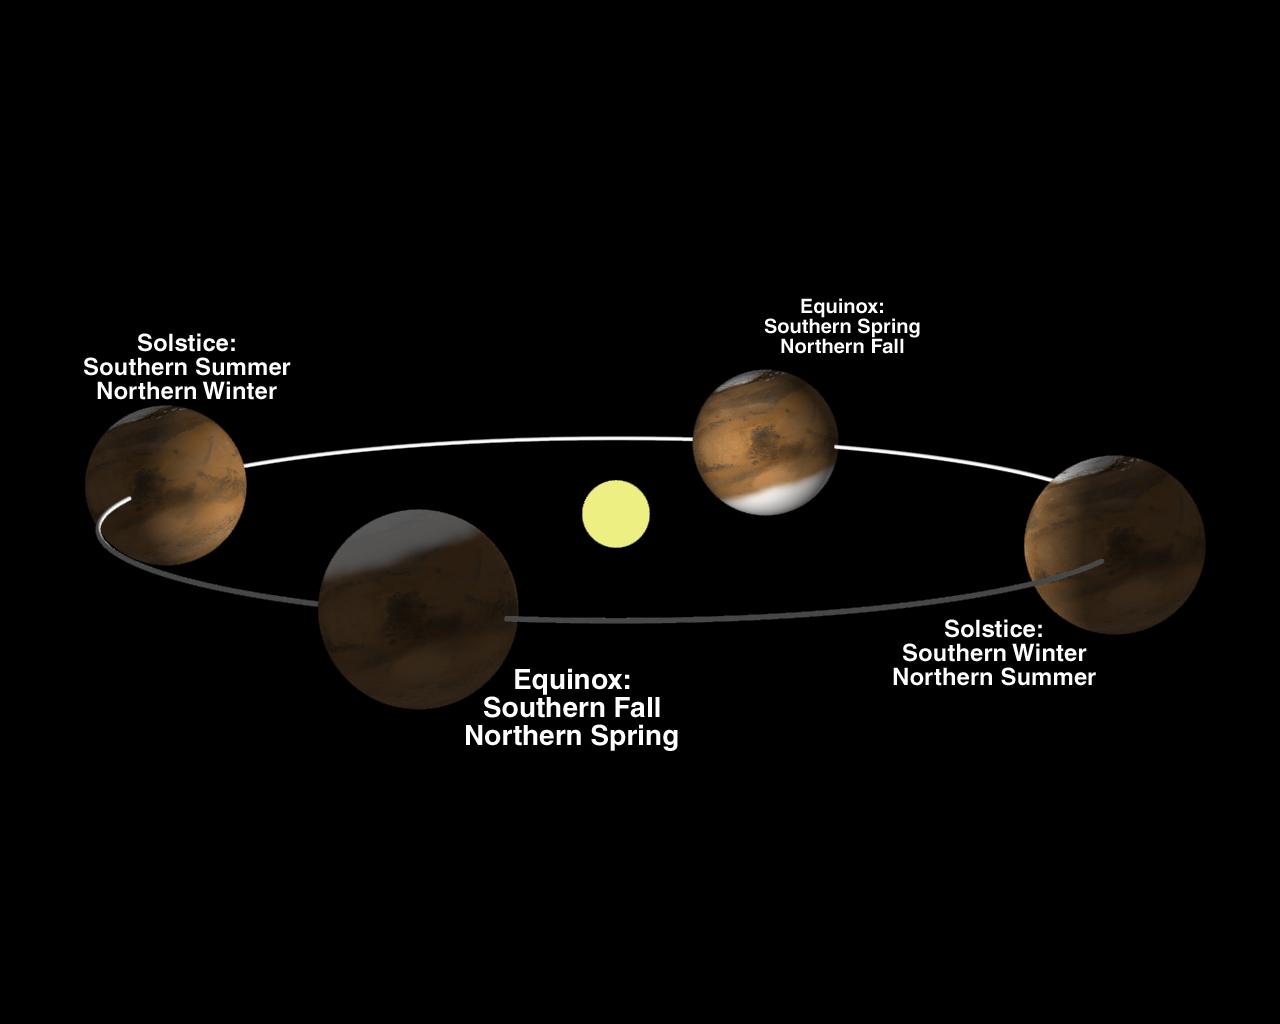 Mars Global Surveyor MOC2 285 Release